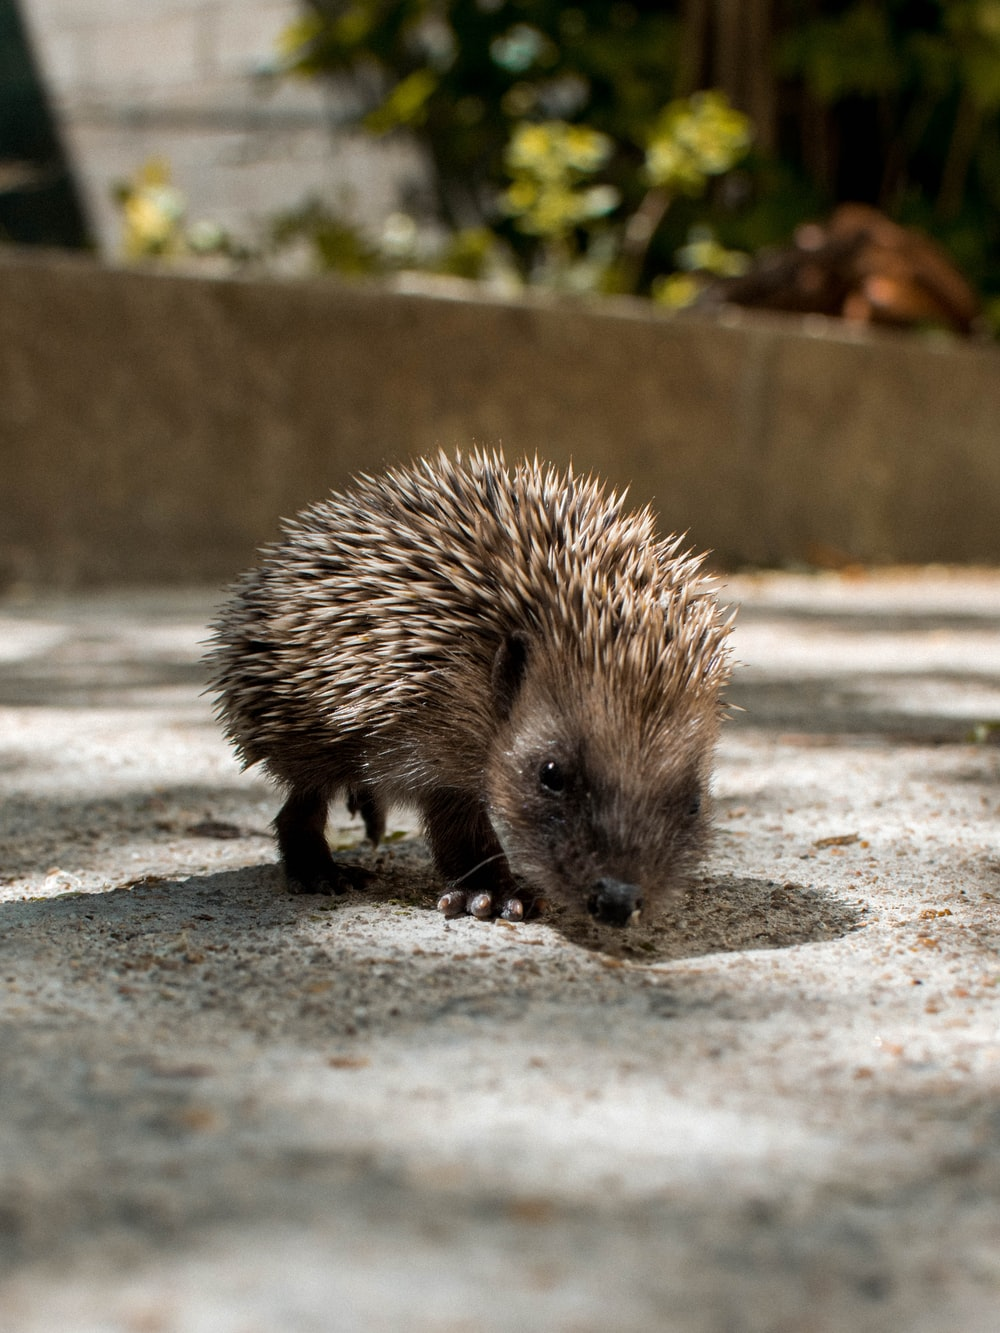 hedgehog on grey concrete floor